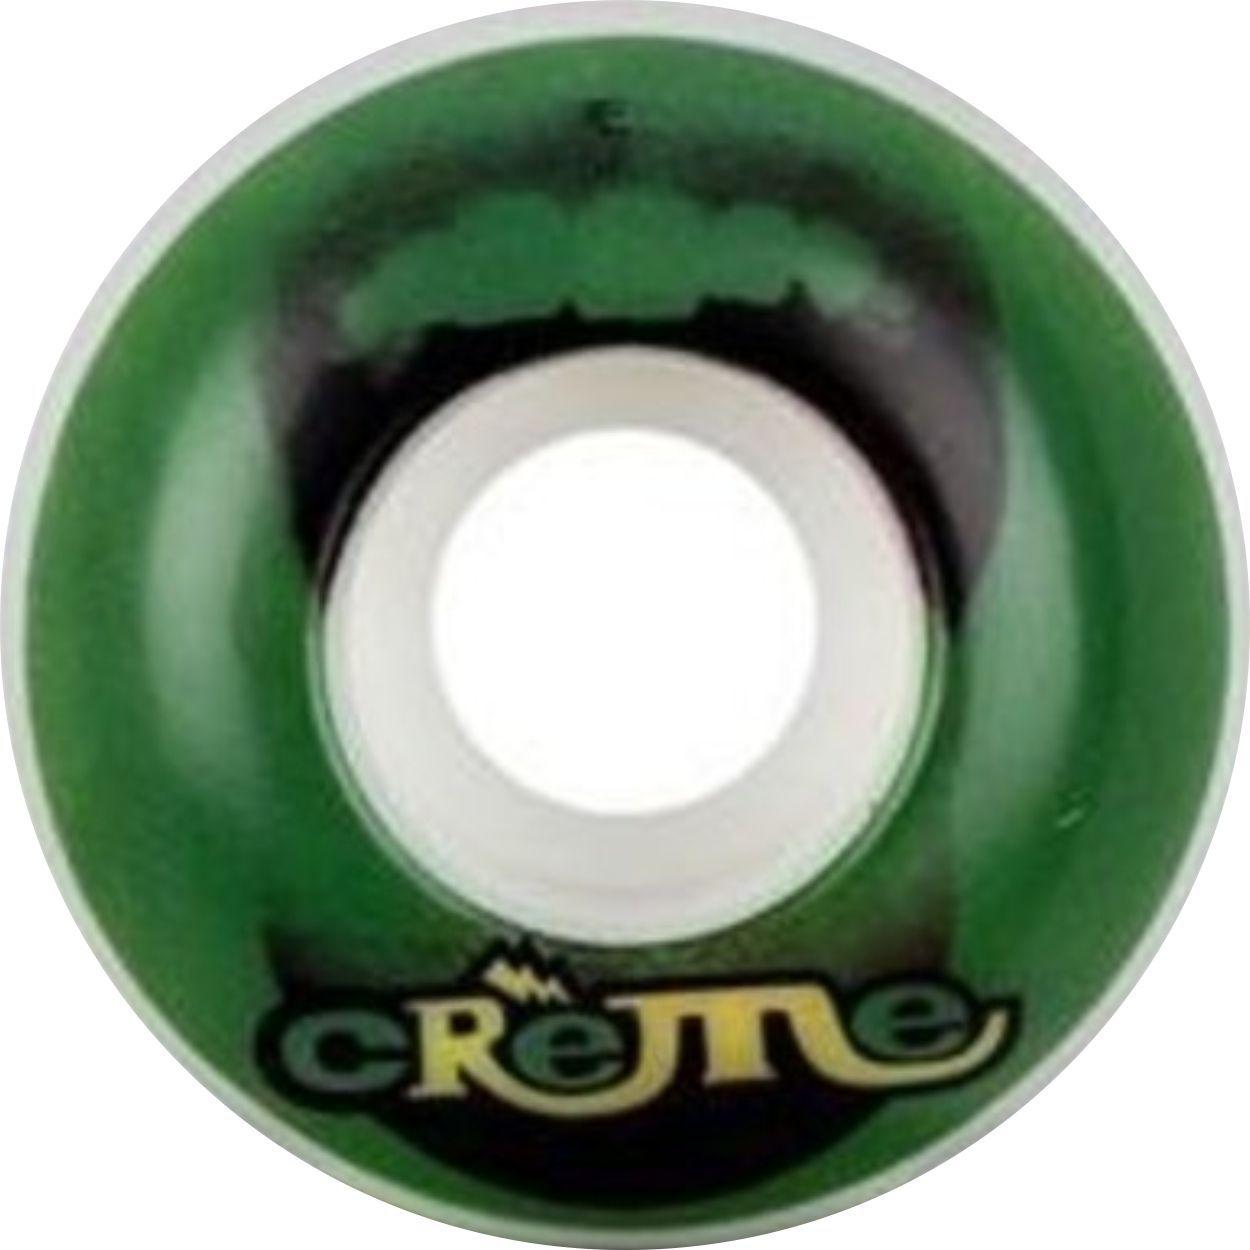 Roda Skate Creme 49mm 100a